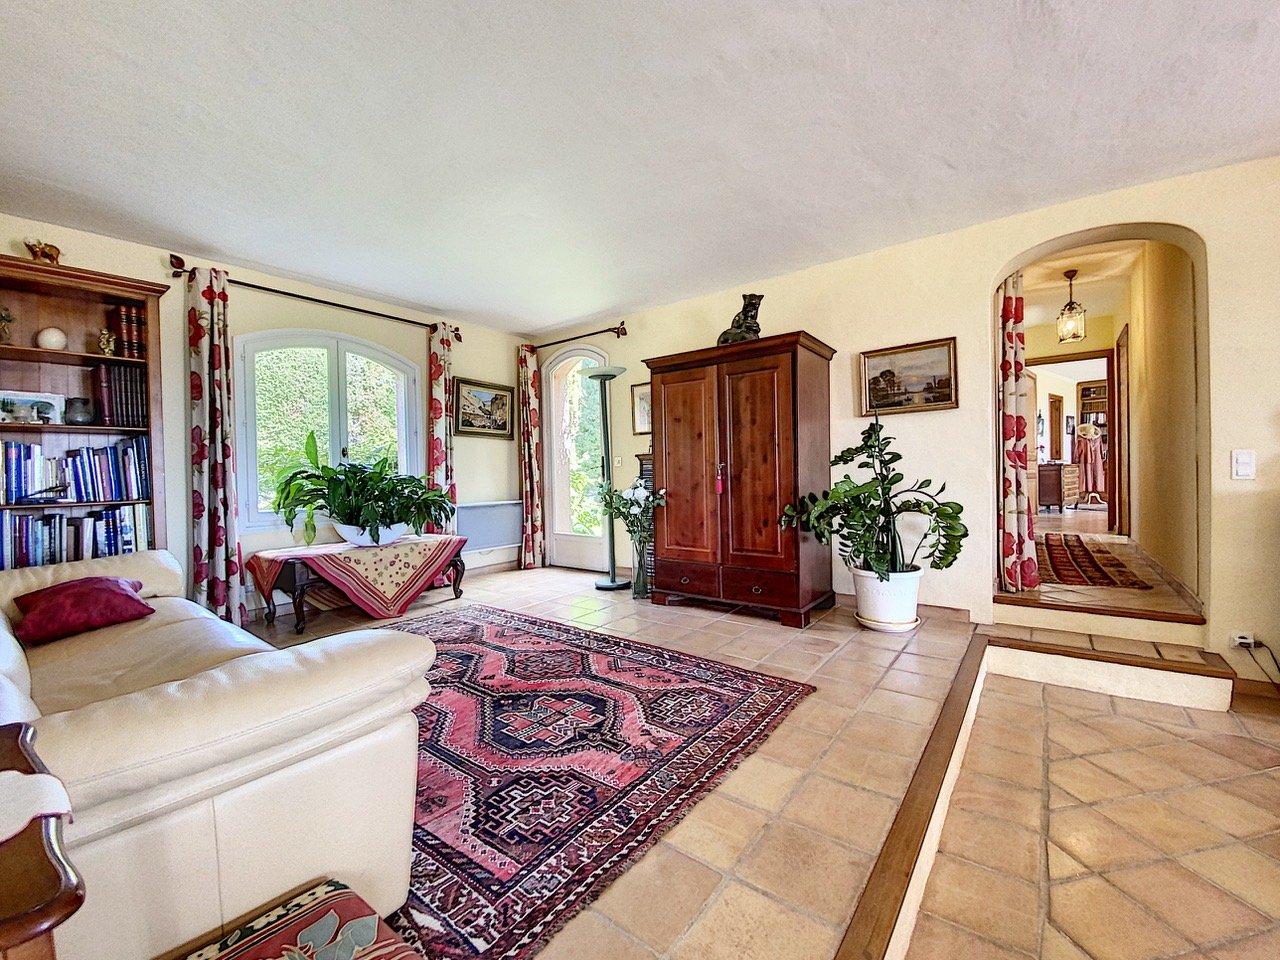 Superbe villa avec vue panoramique au calme